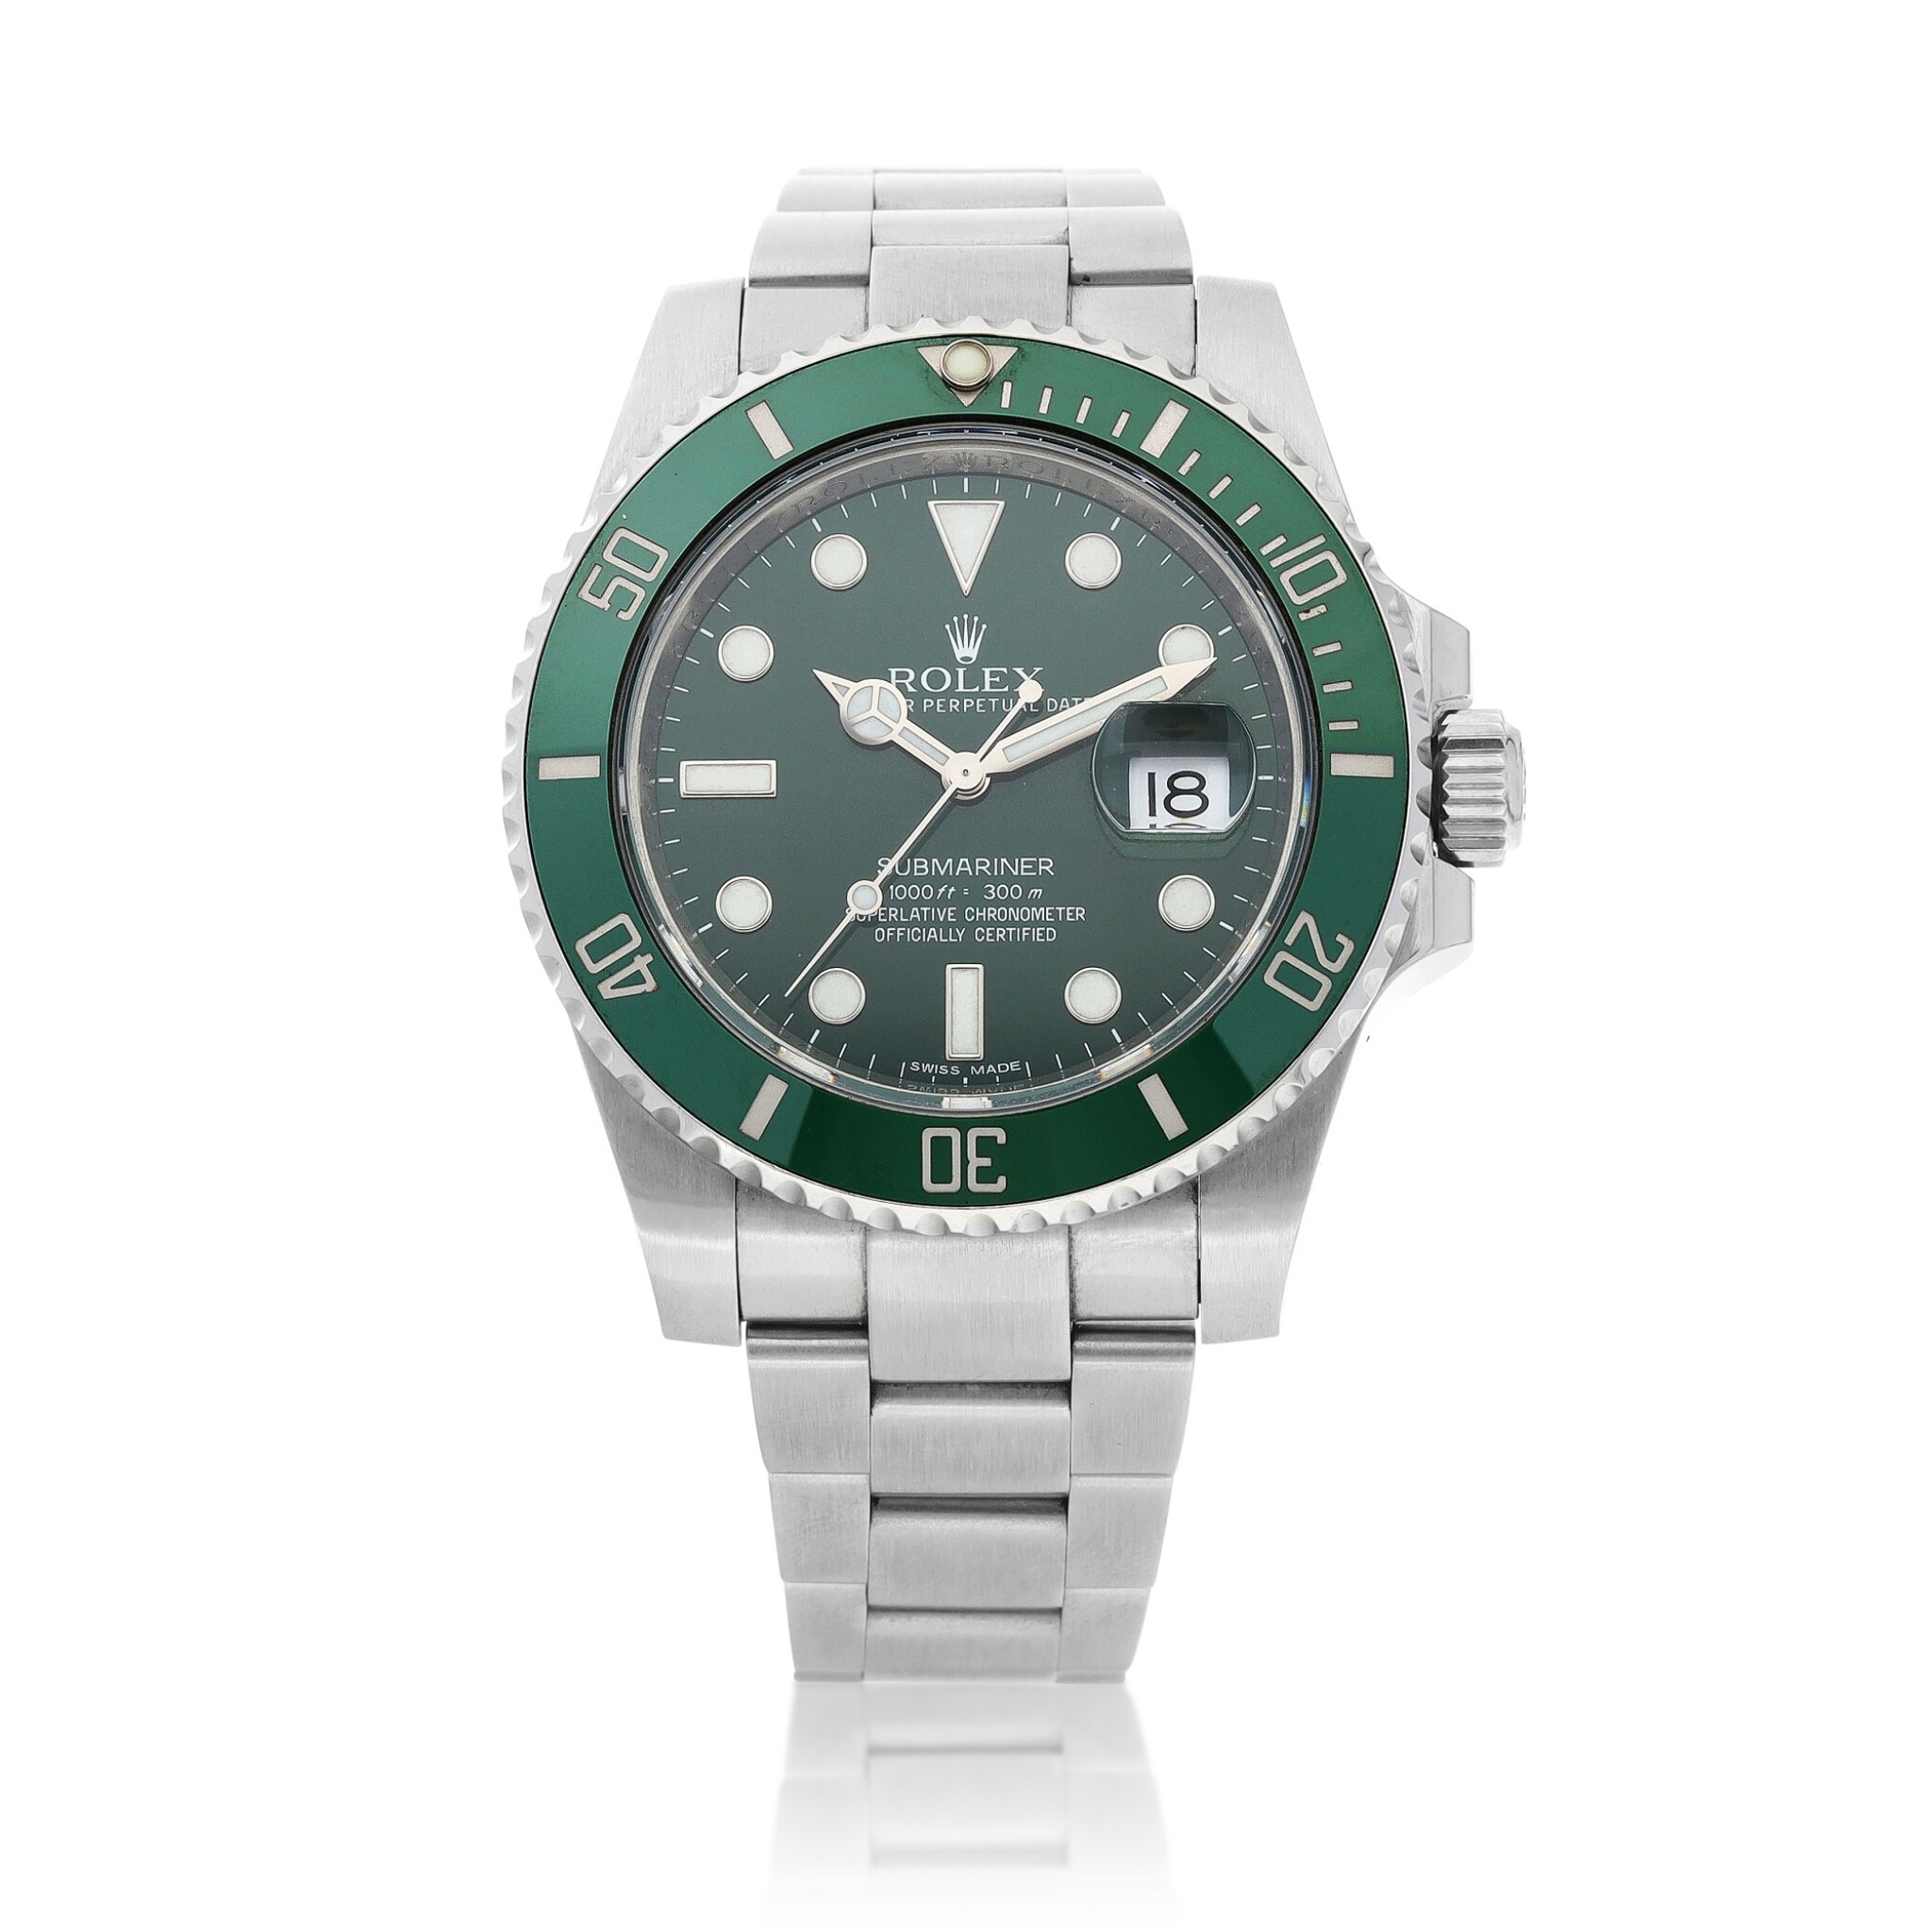 View full screen - View 1 of Lot 406. 'Hulk' Submariner, Ref. 116610LV Stainless steel wristwatch with date and bracelet Circa 2010 | 勞力士 116610LV型號「'Hulk' Submariner」精鋼鍊帶腕錶備日期顯示,年份約2010.